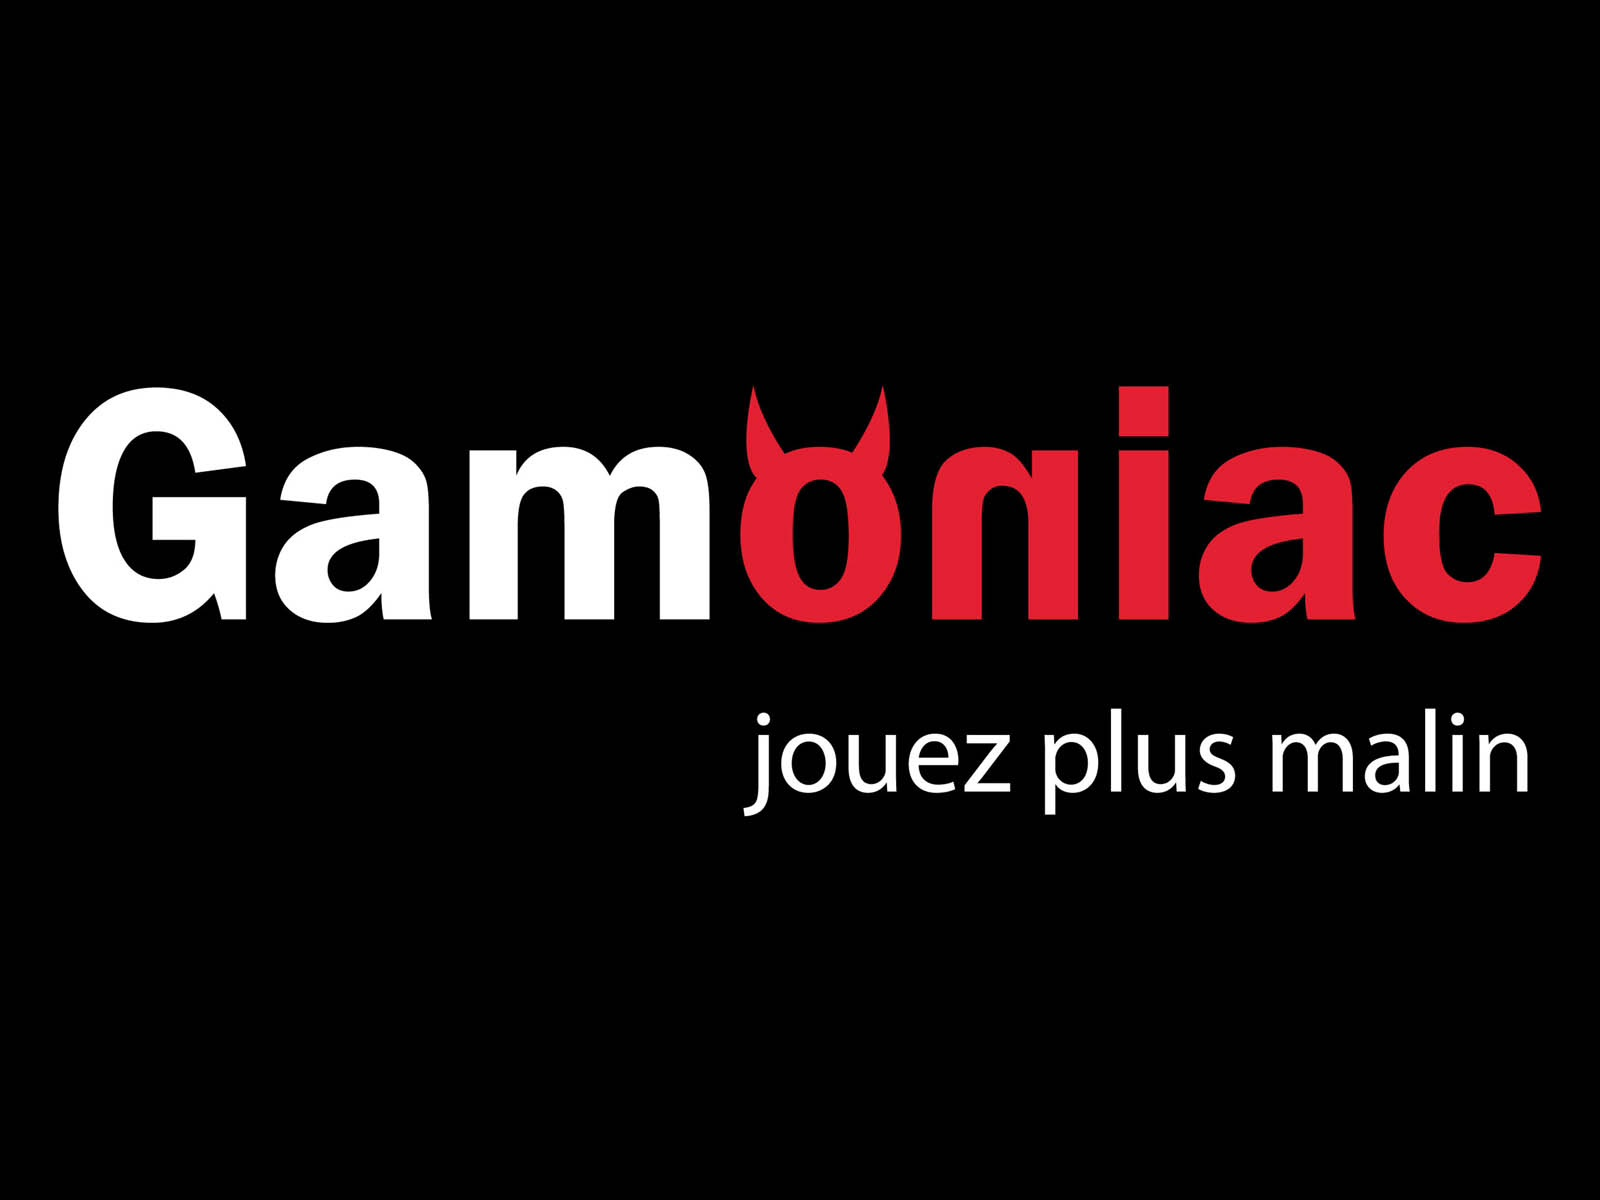 [PARTENAIRES] Decouverte de Gamoniac